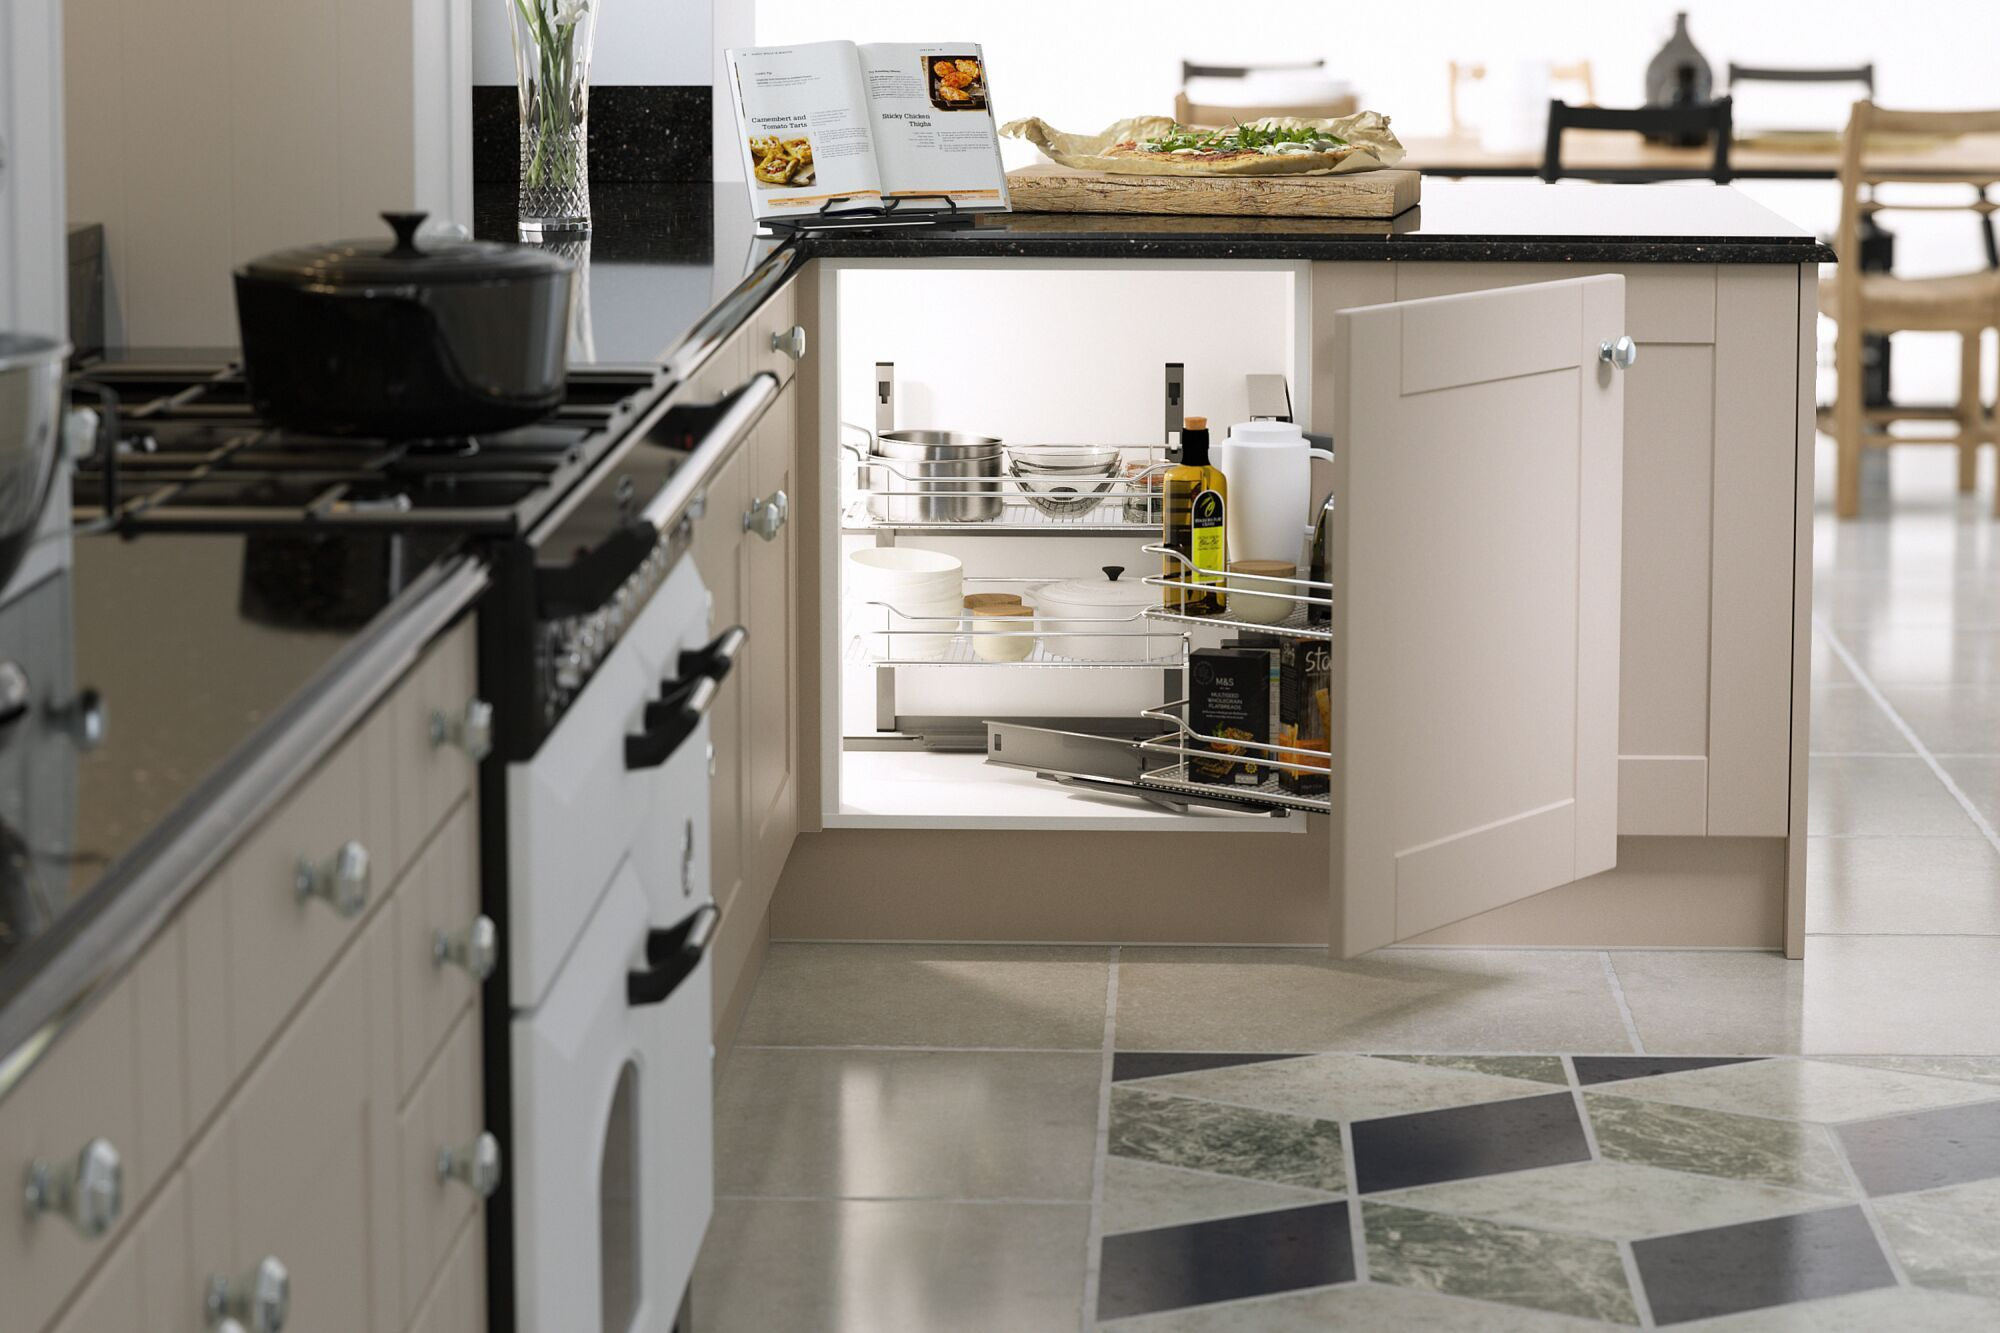 Shaker Kitchen in Mink and Chalk White